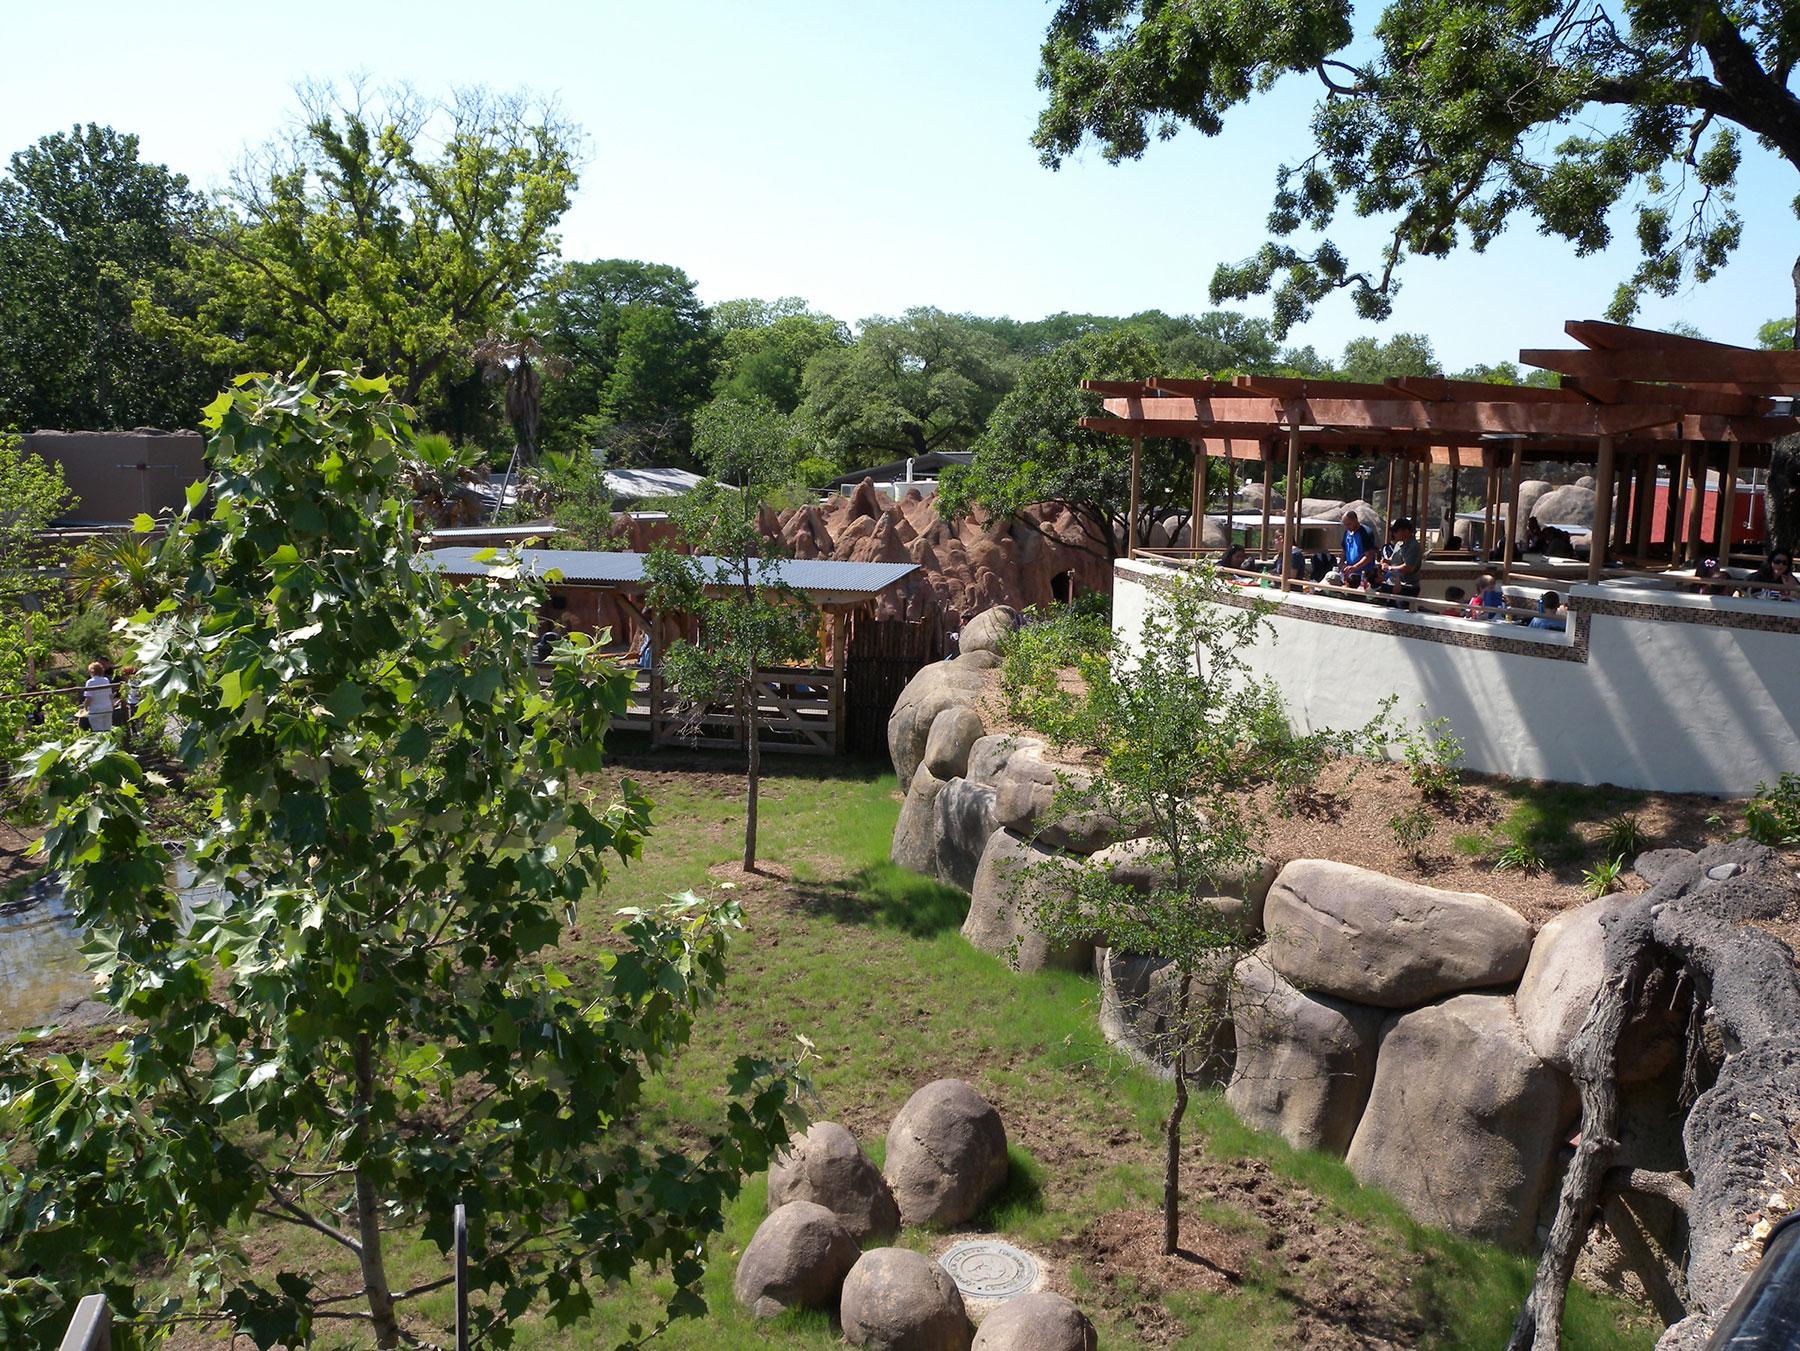 Africa Live! San Antonio Zoo, Phase II – Nassal